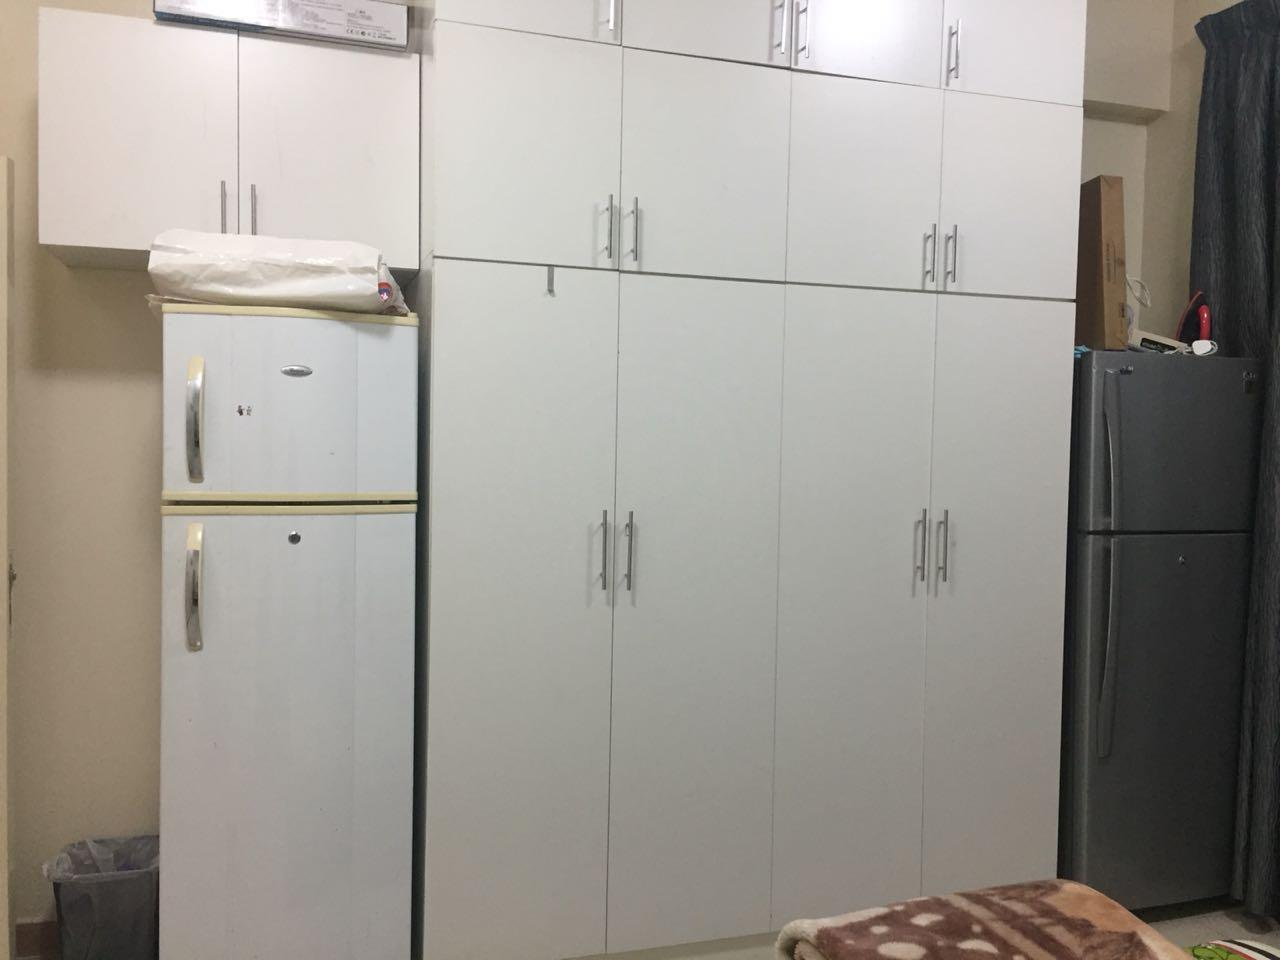 Both refrigerators will go in kitchen